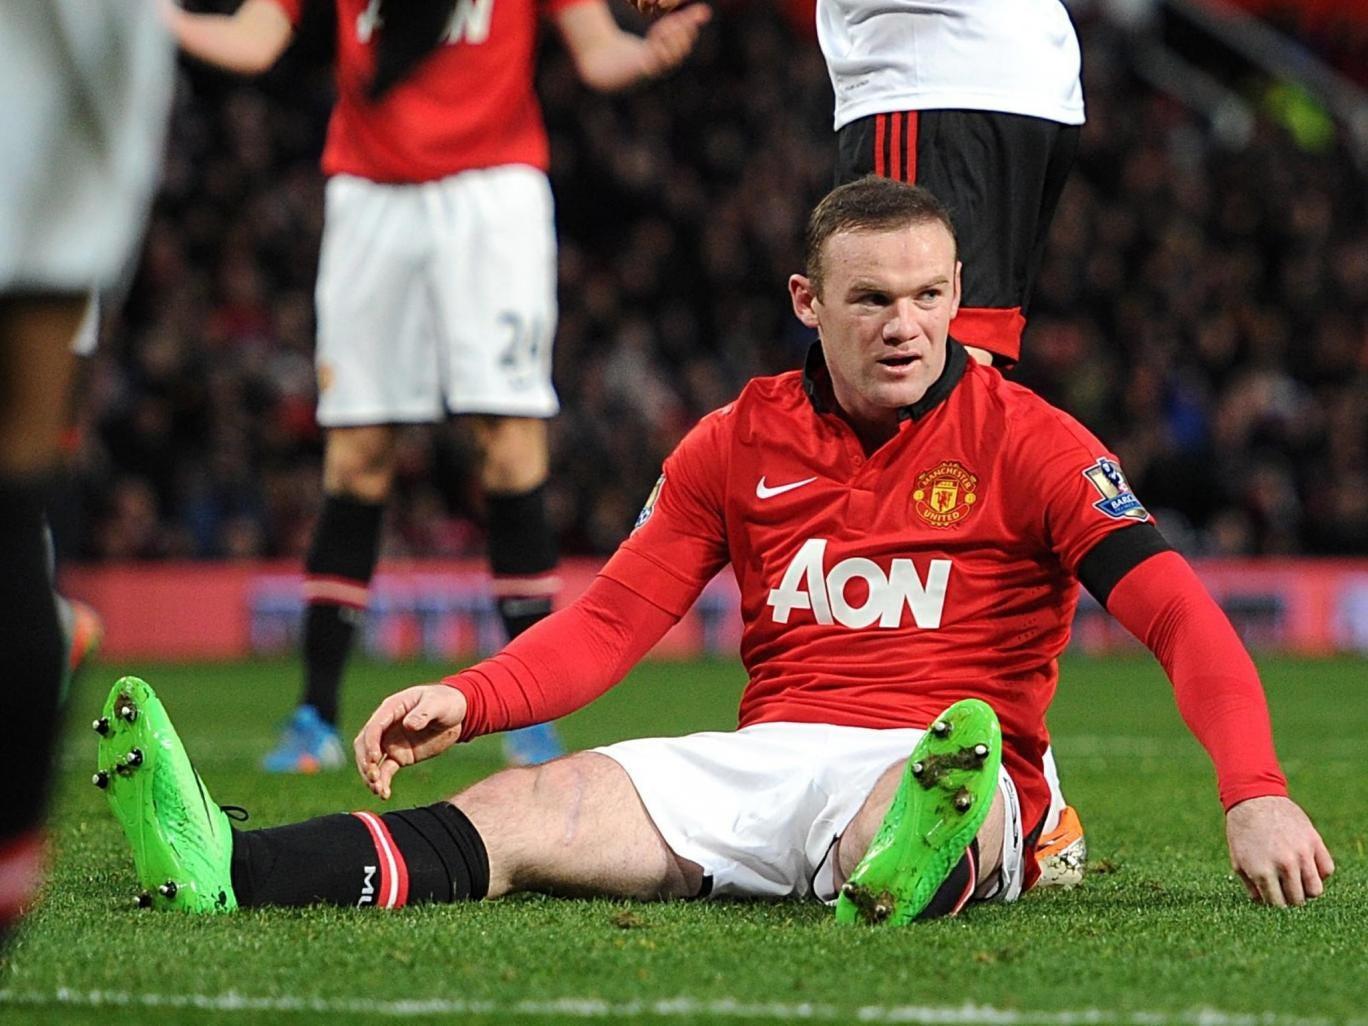 Wayne Rooney missed three weeks of the season with a groin injury